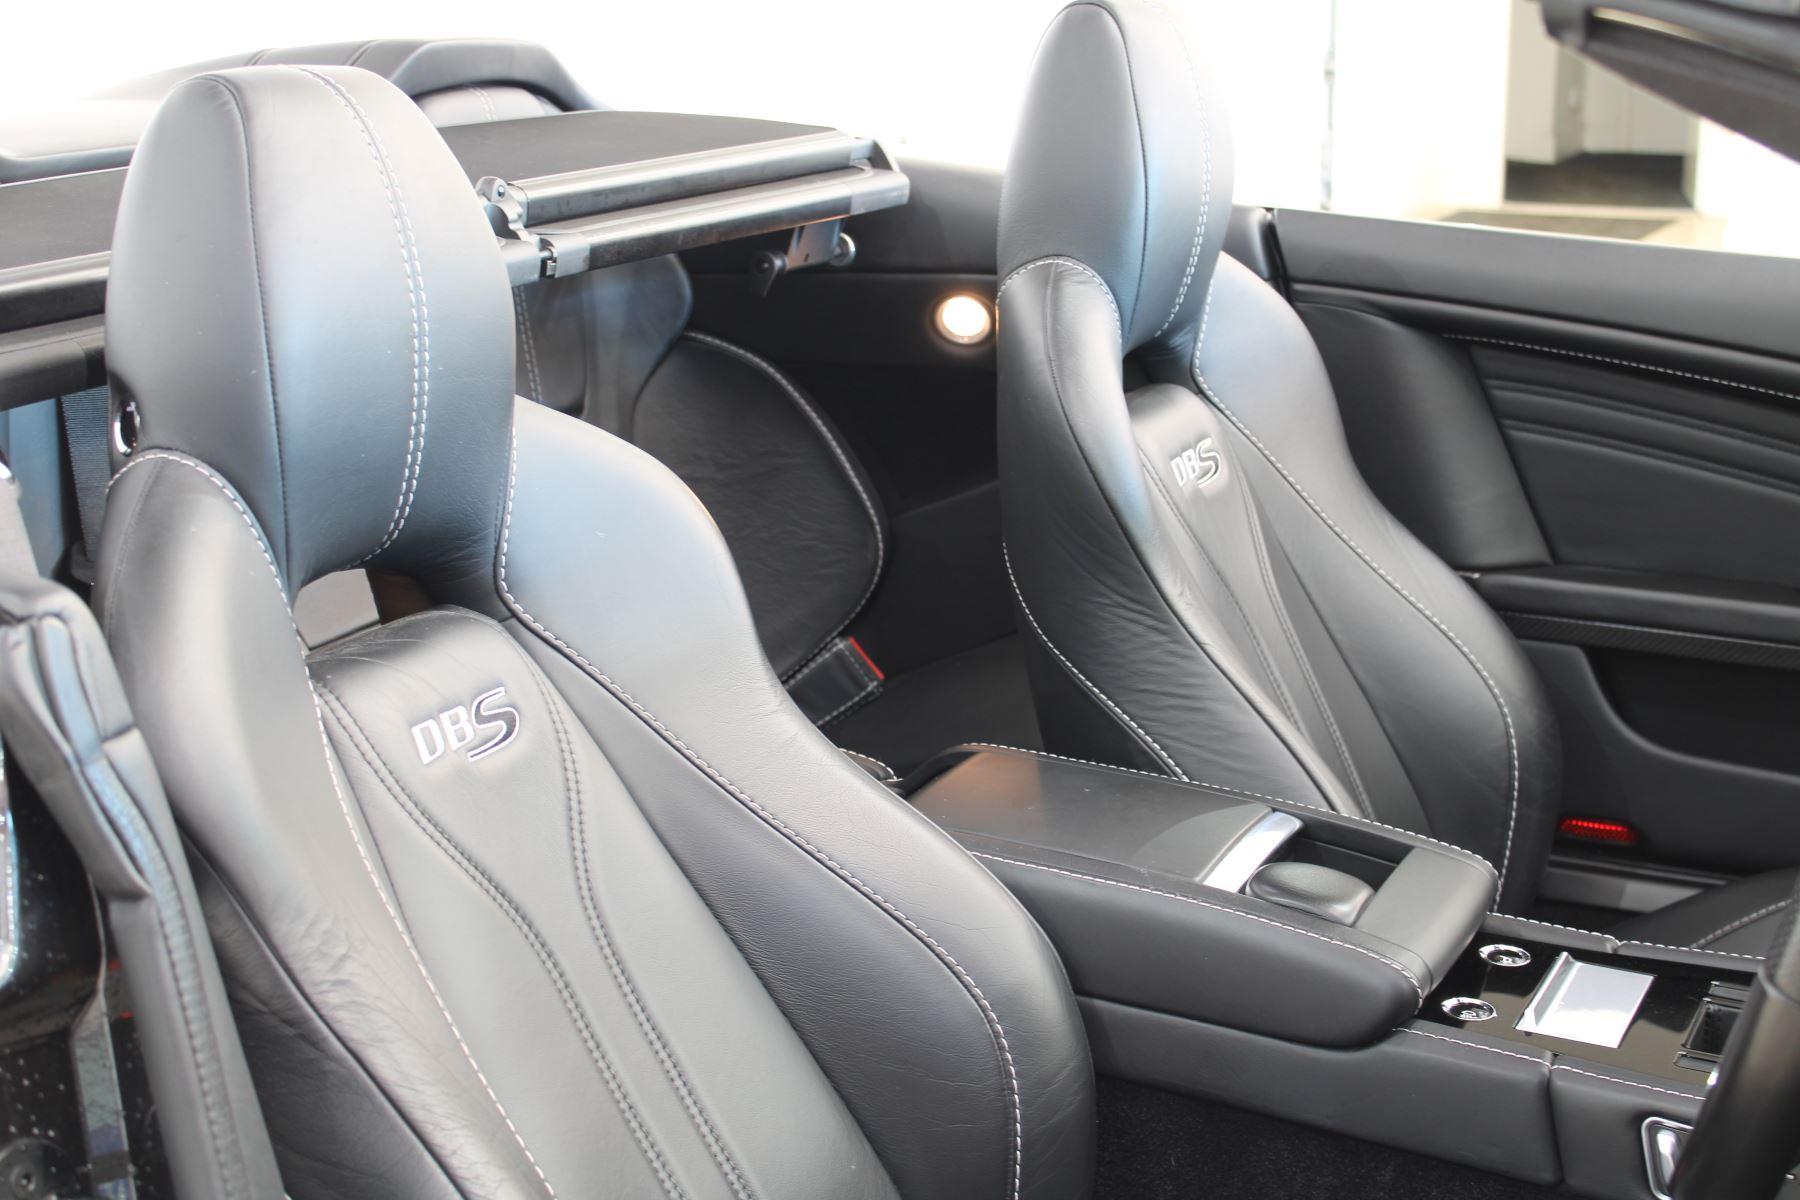 Aston Martin DBS CARBON V12 2dr Volante Touchtronic image 16